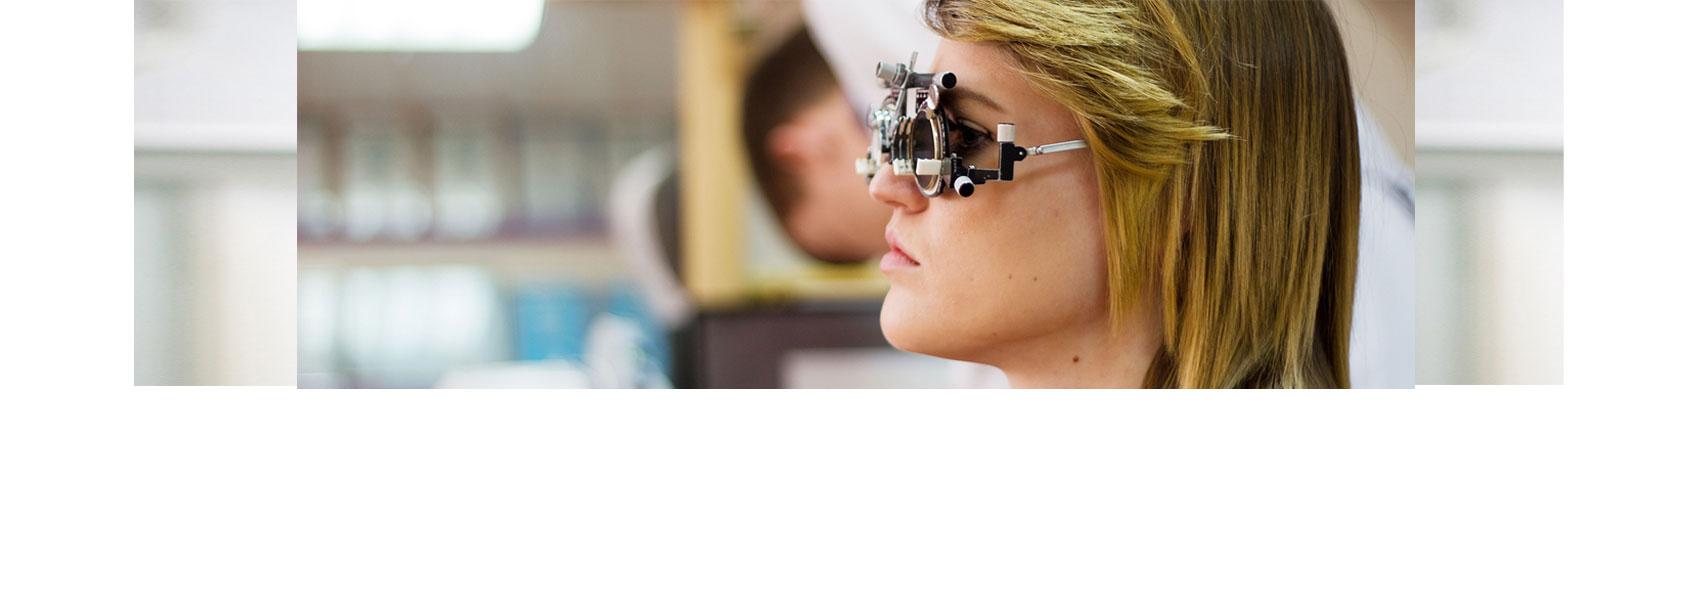 Комплексная диагностика зрения